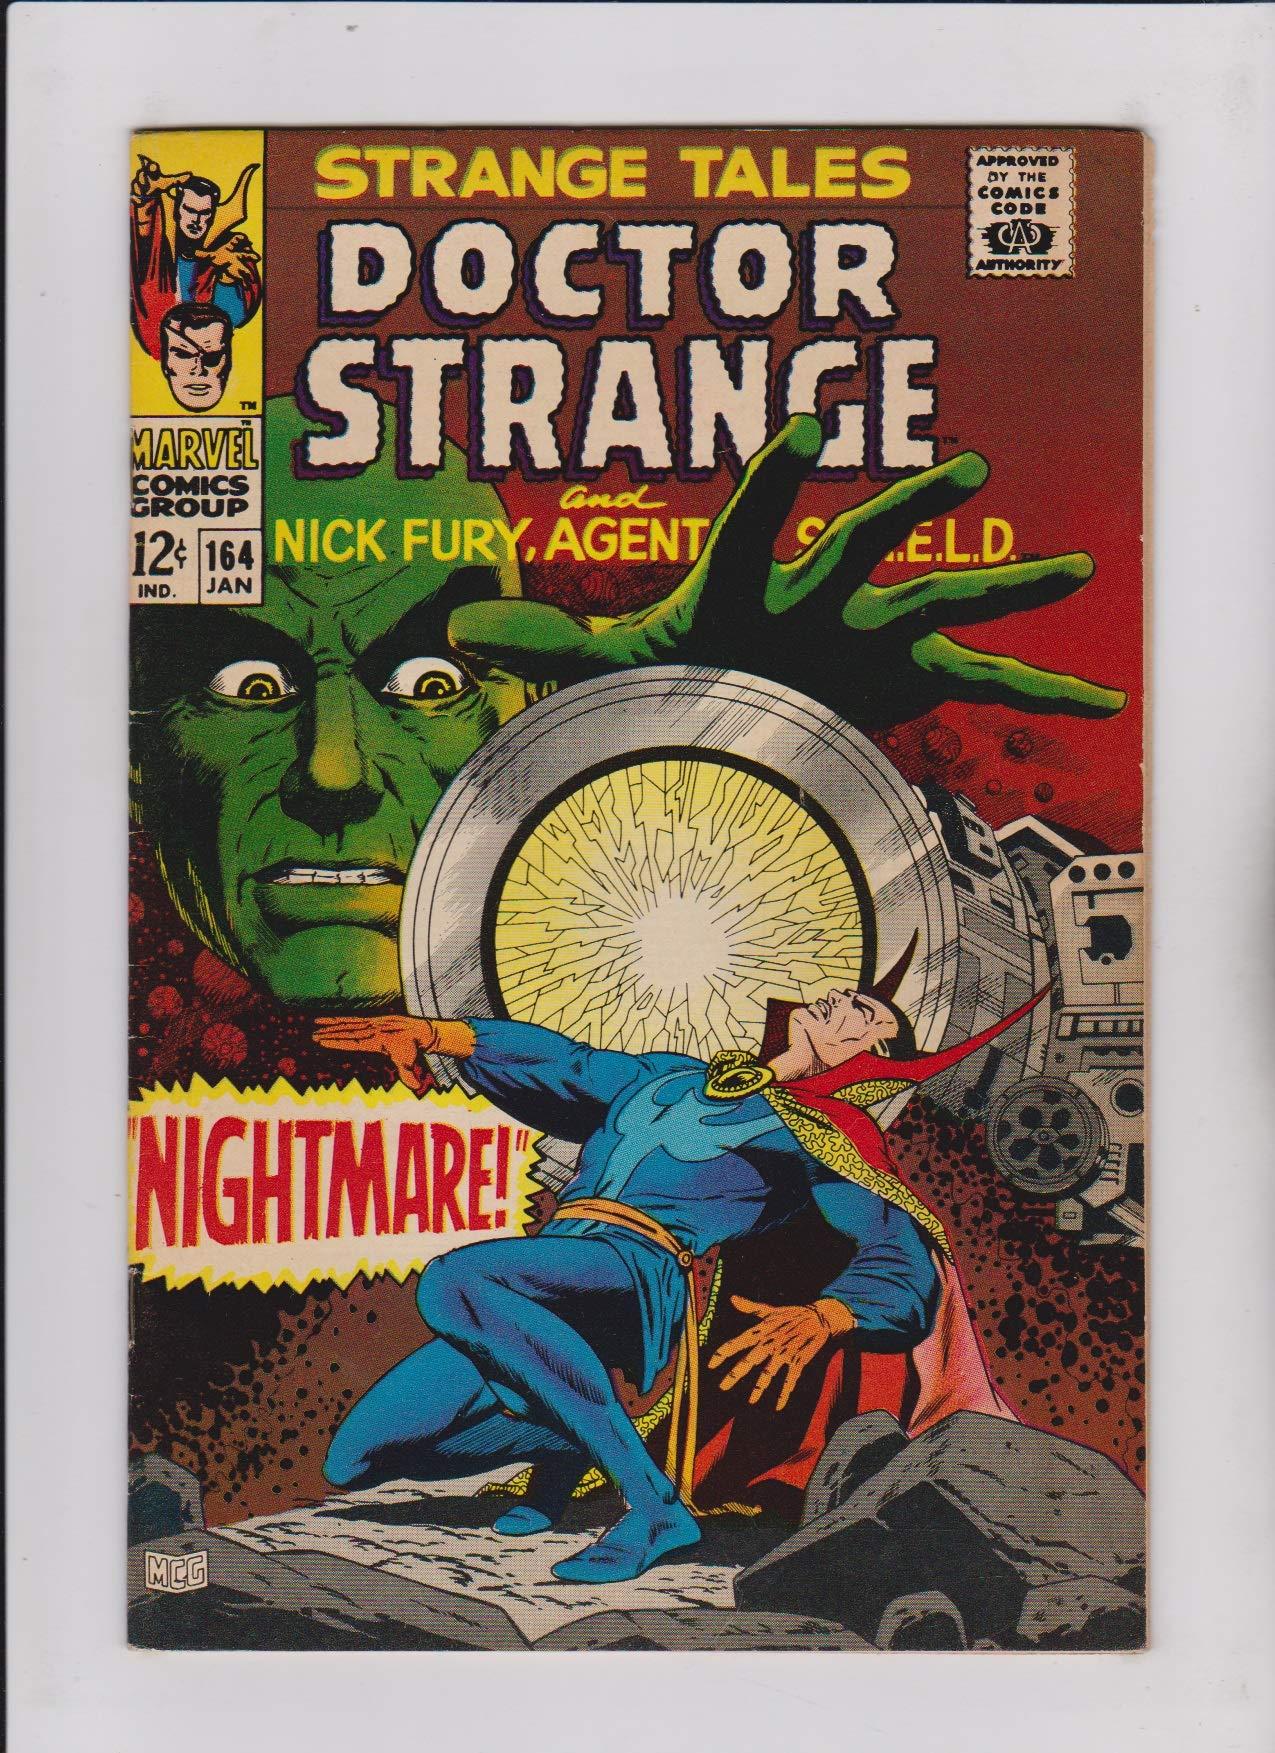 Strange Tales 136-167 U-pick Doctor Strange Nick Fury UNLIMITED $4.15 SHIPPING